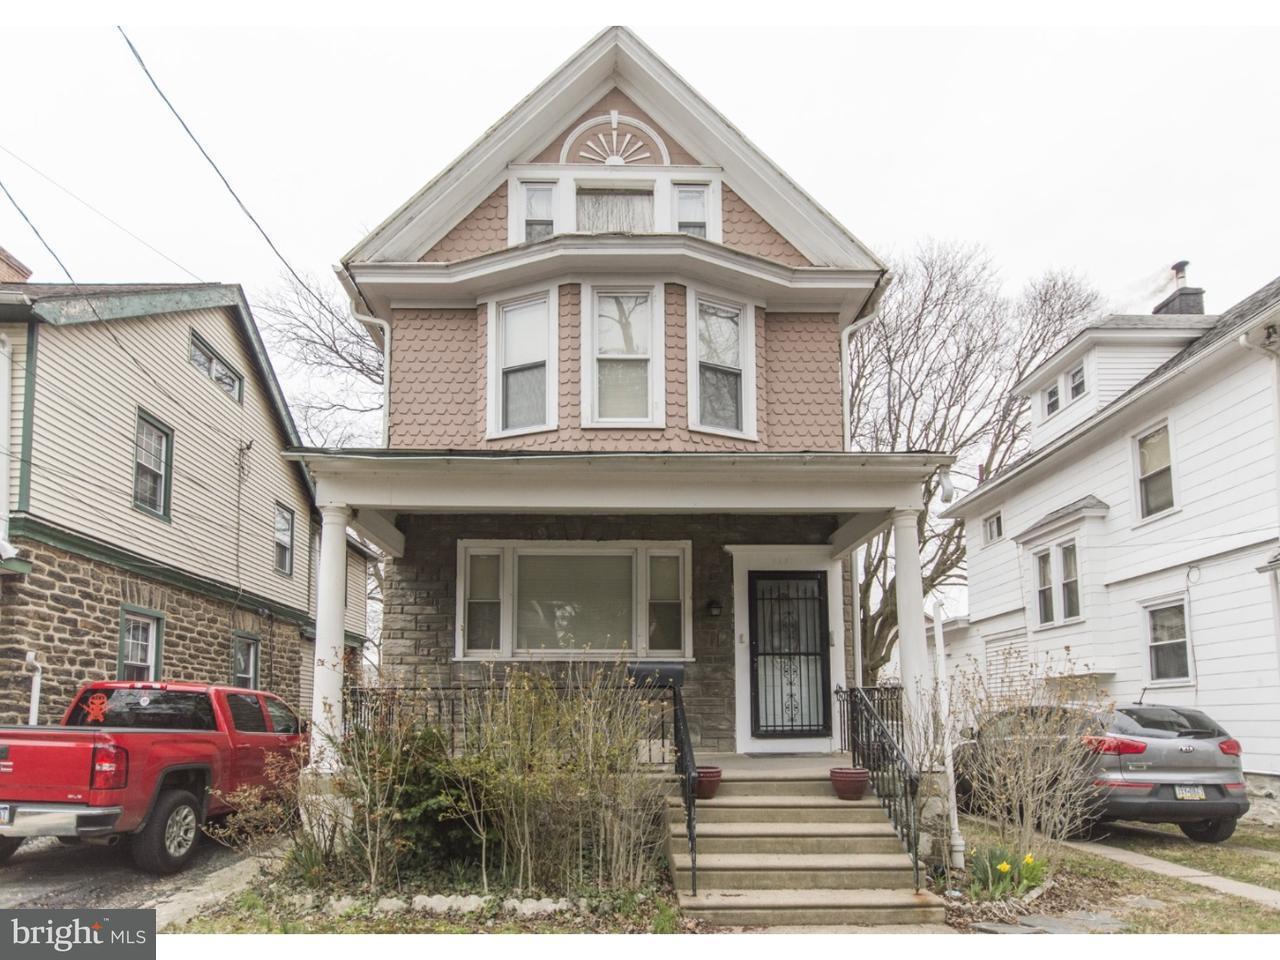 6441 N Park Avenue Philadelphia, PA 19126